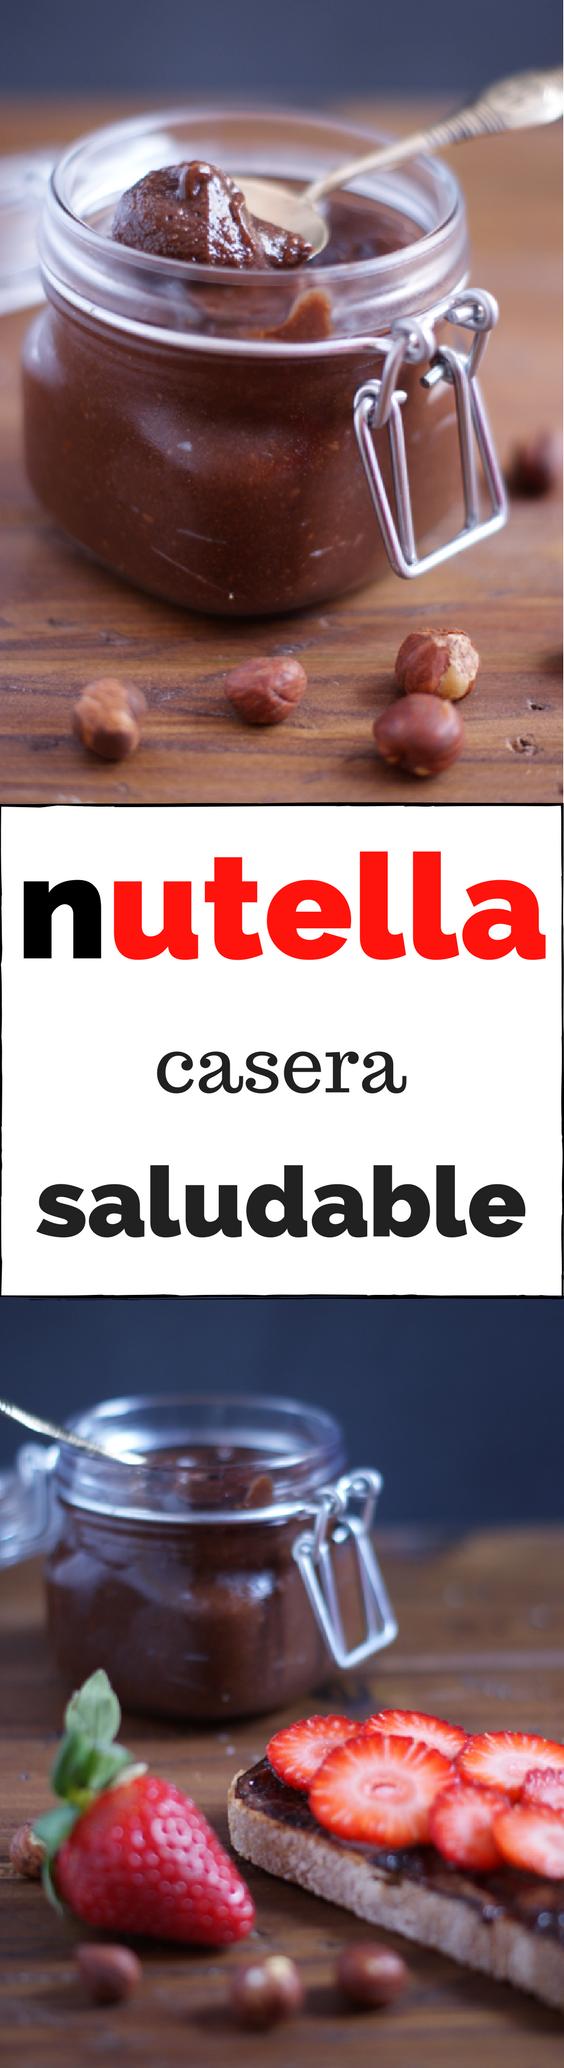 Nutella casera saludable